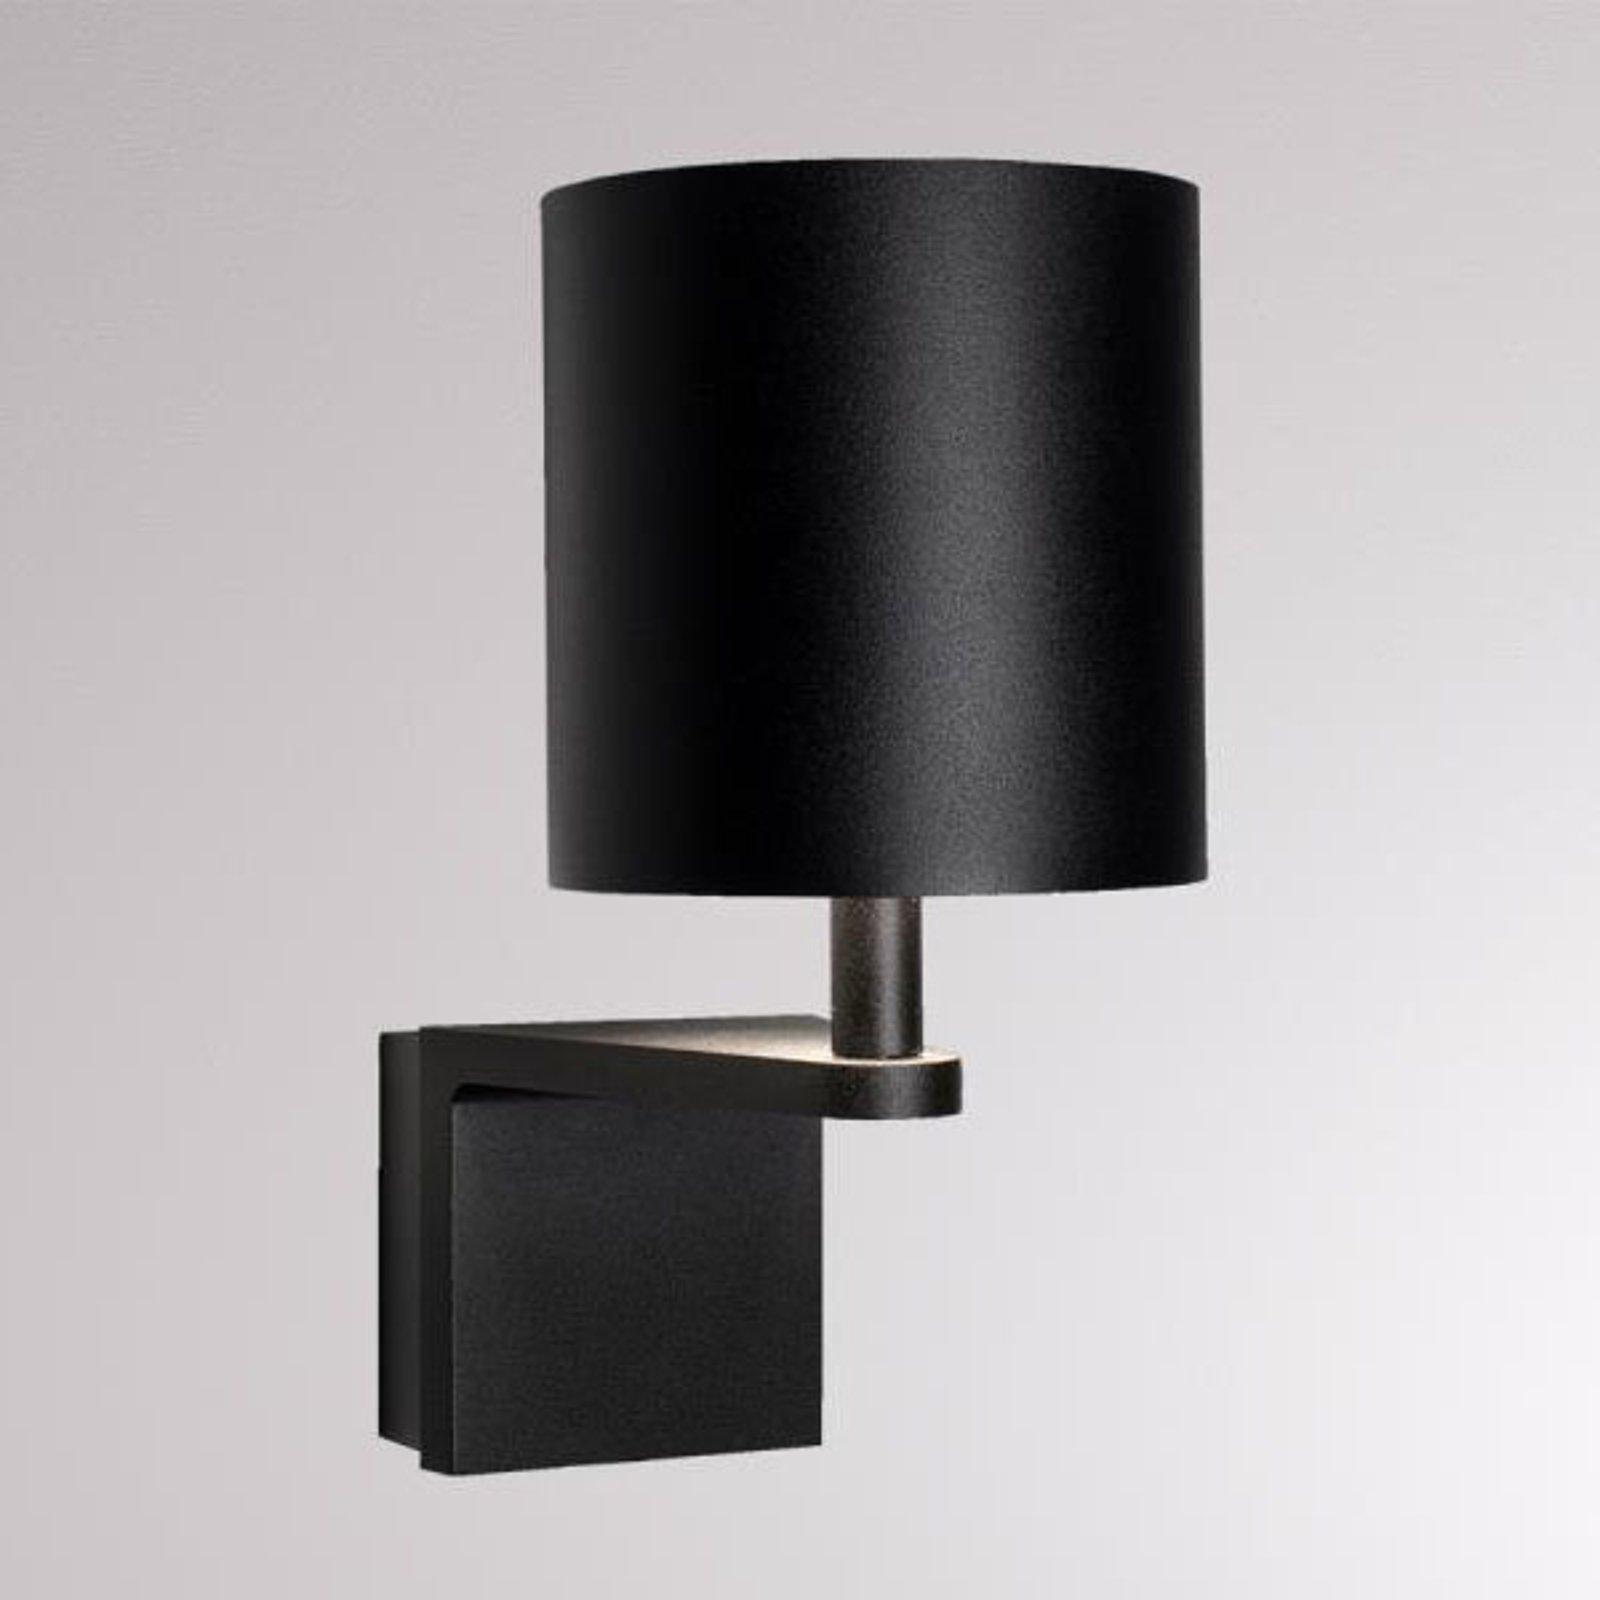 LOUM Waamp LED-vegglampe svart/gull